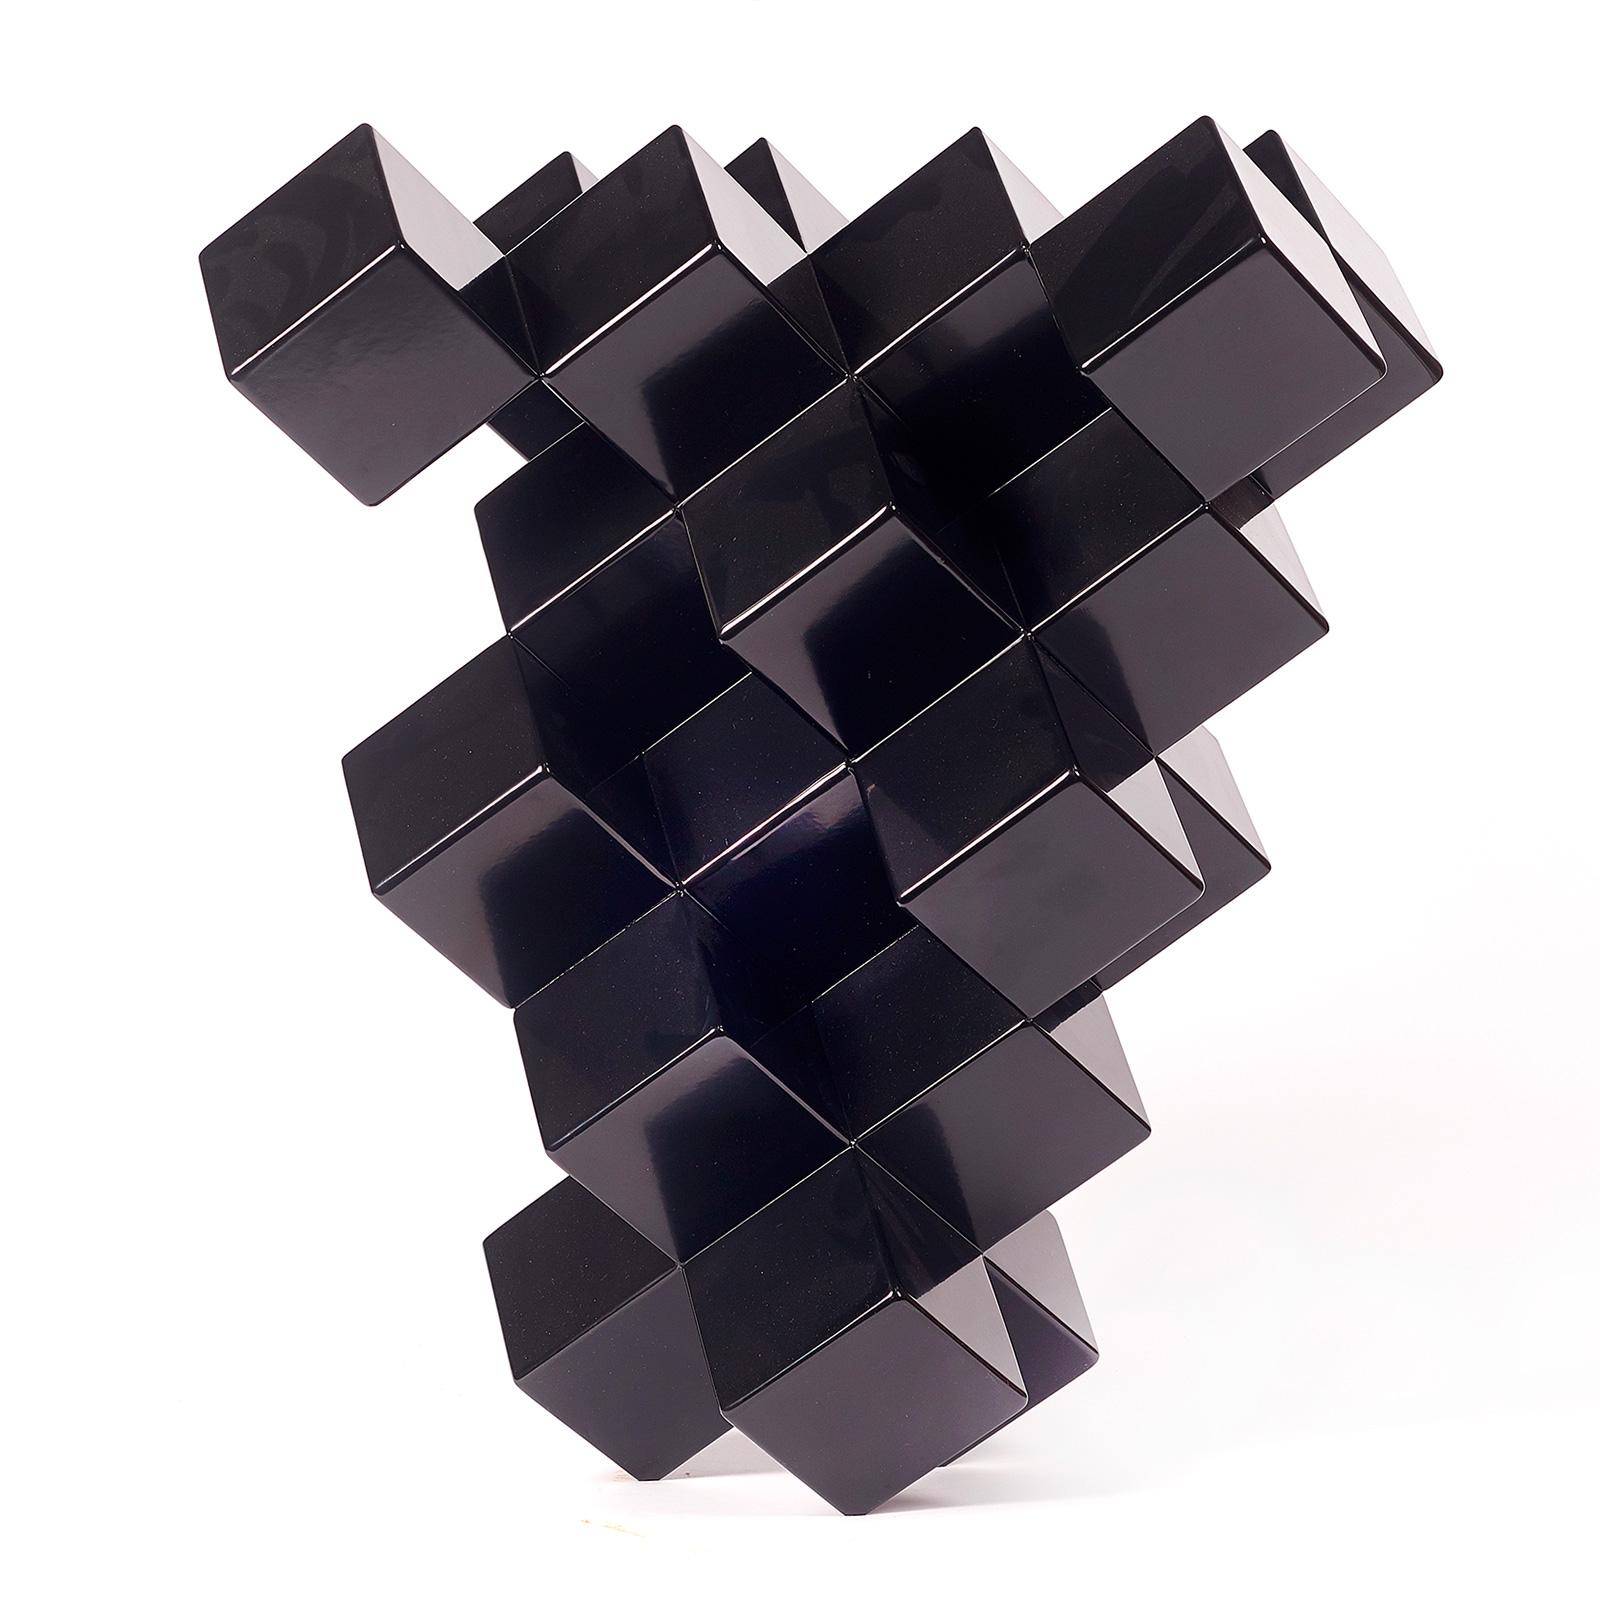 2018_04_08_will_nash_black_cubic_008_int_web_square.jpg